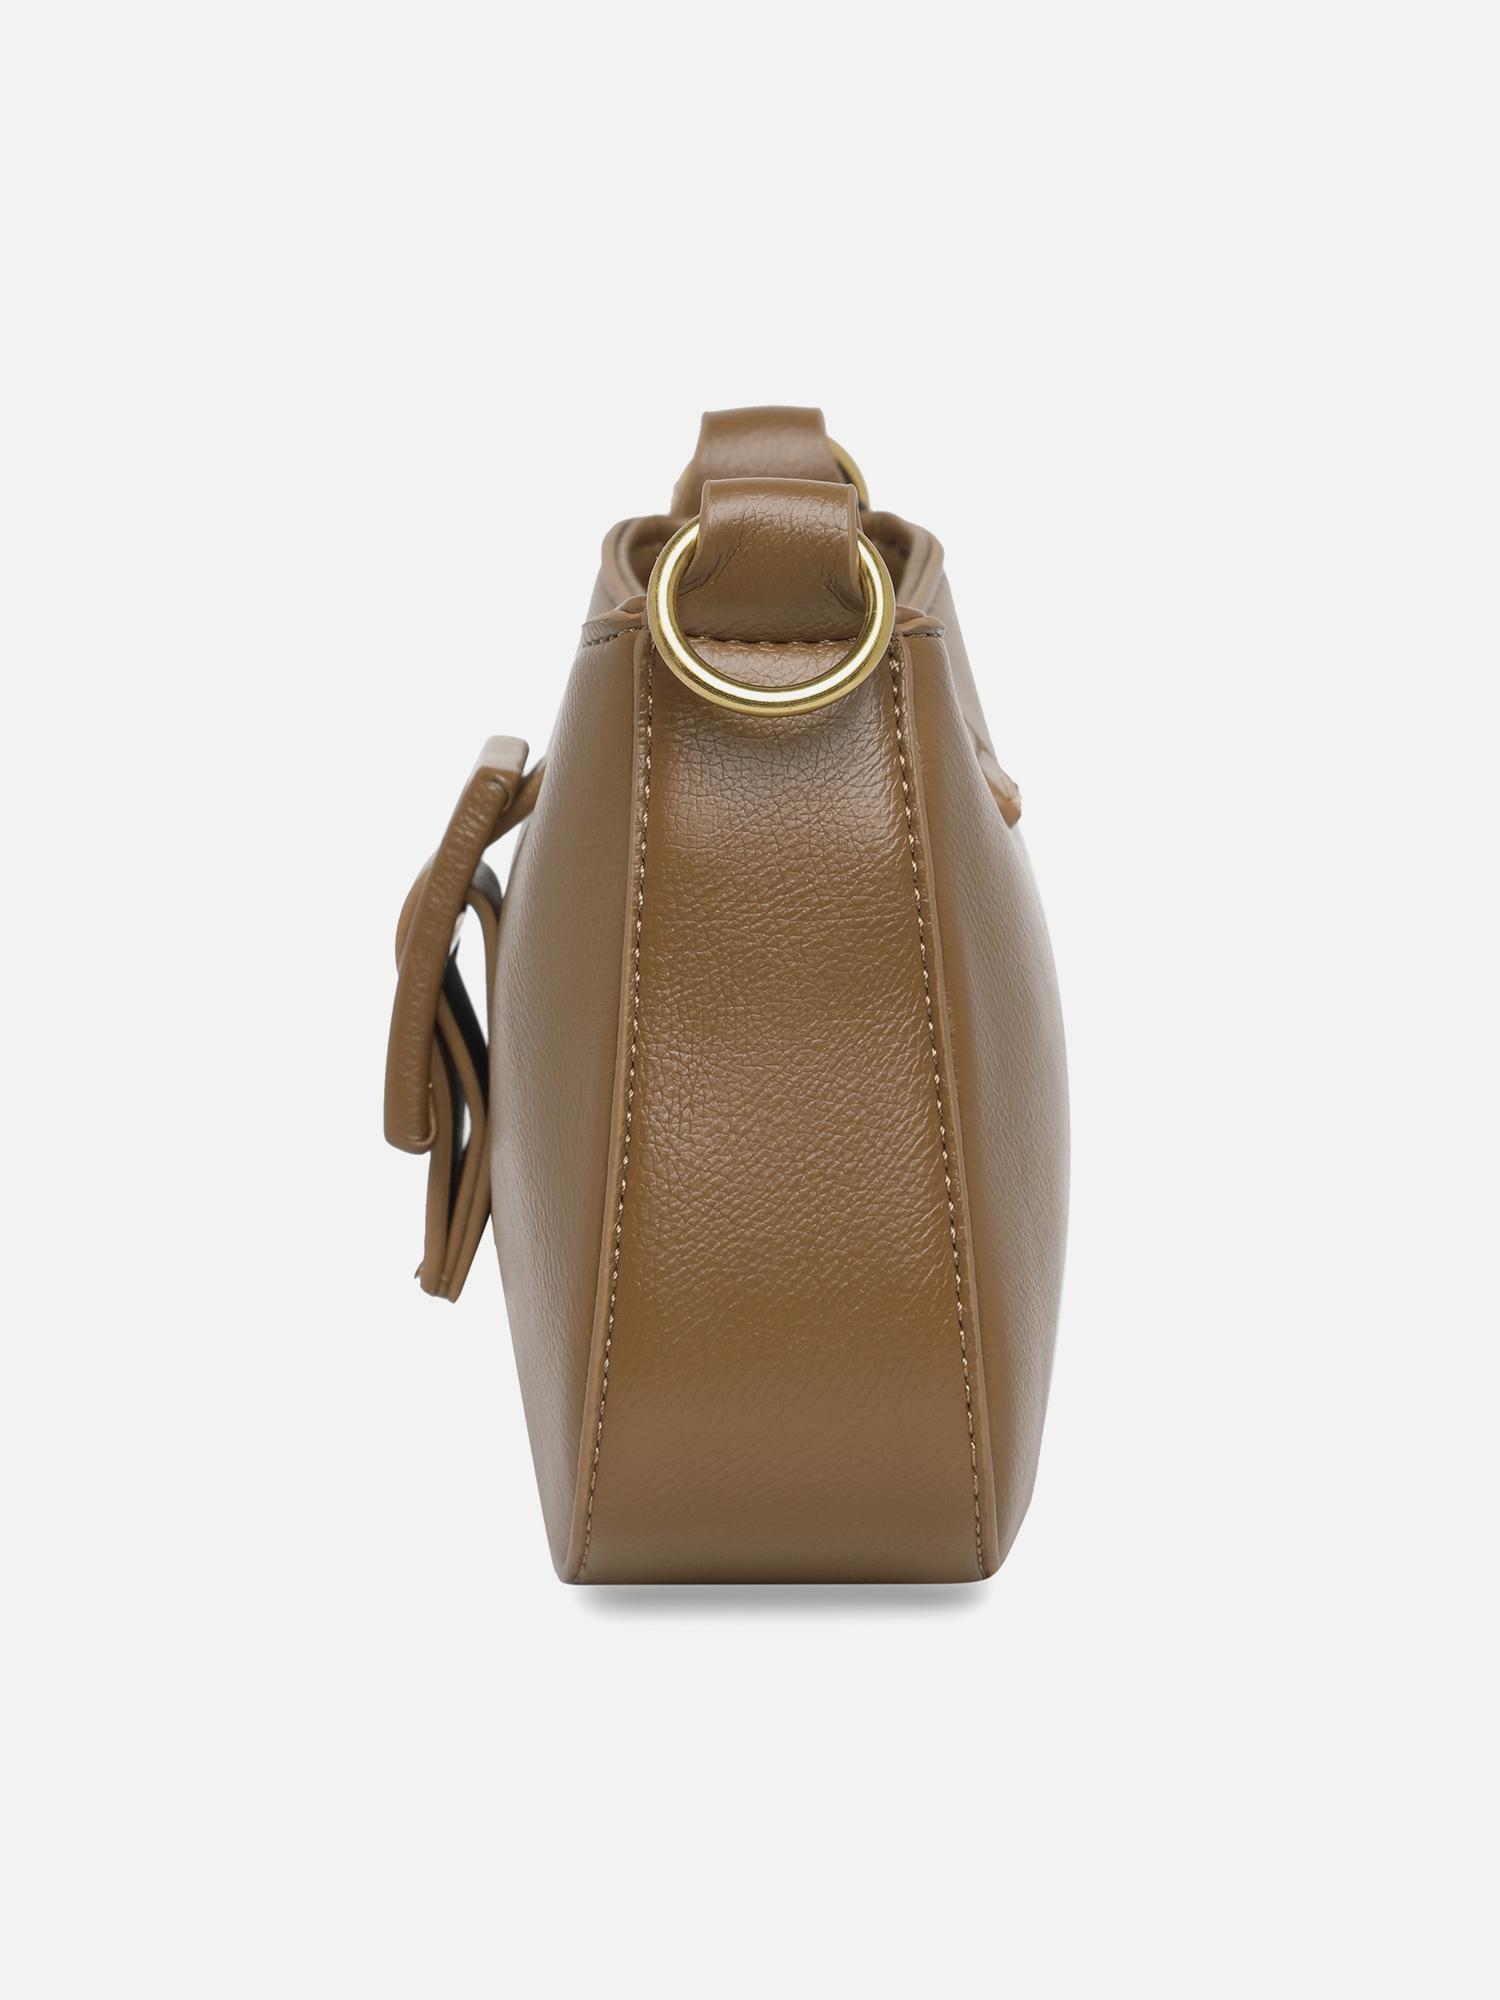 Slings-Brown Forever Love Bag6